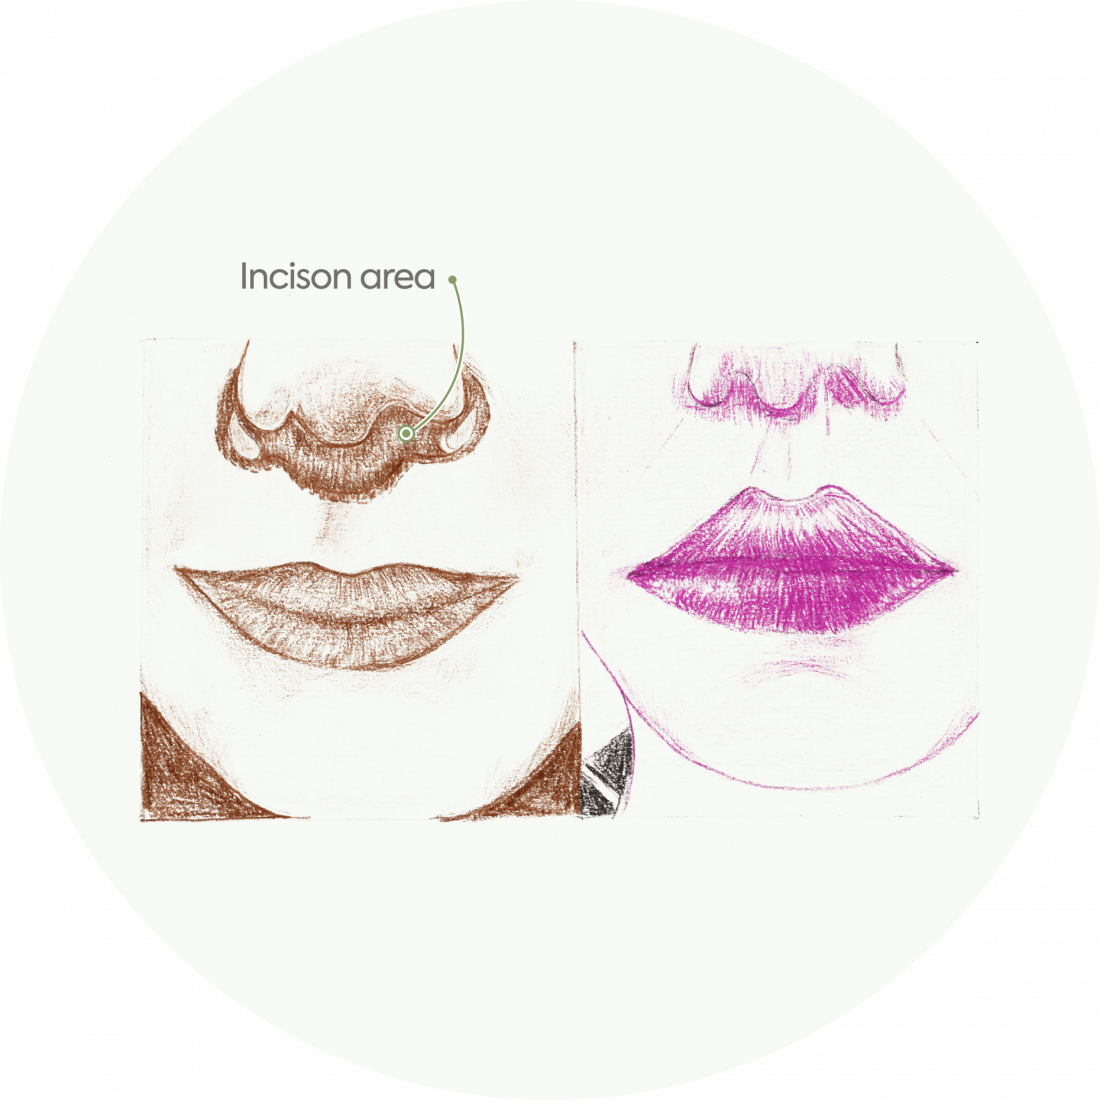 Procedure details: Lip Lift